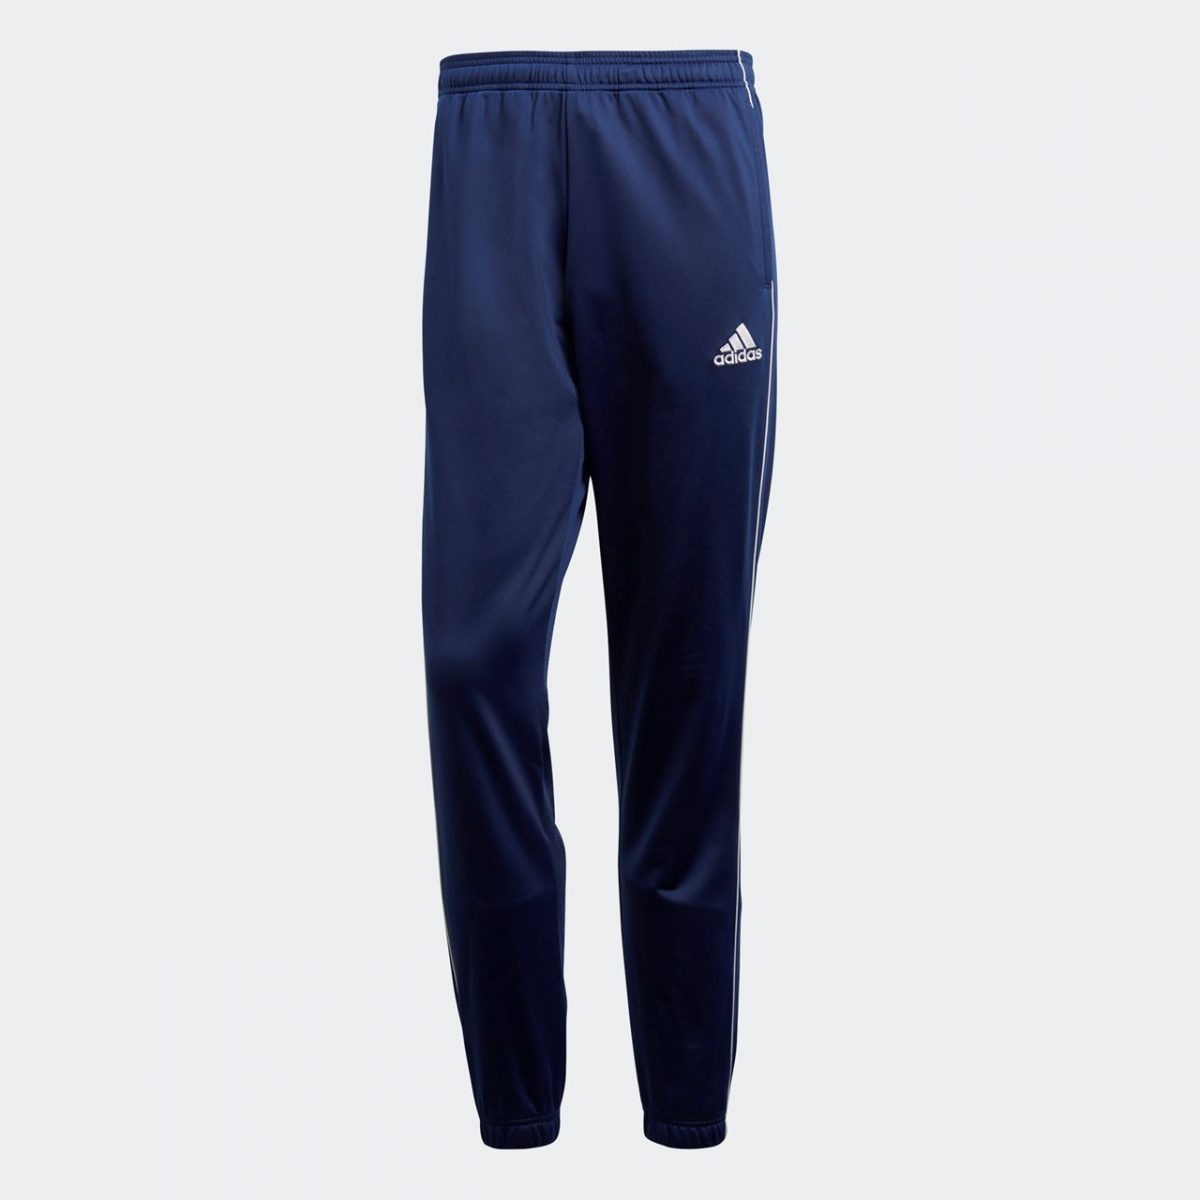 Adidas Core 18 PES Pant Junior